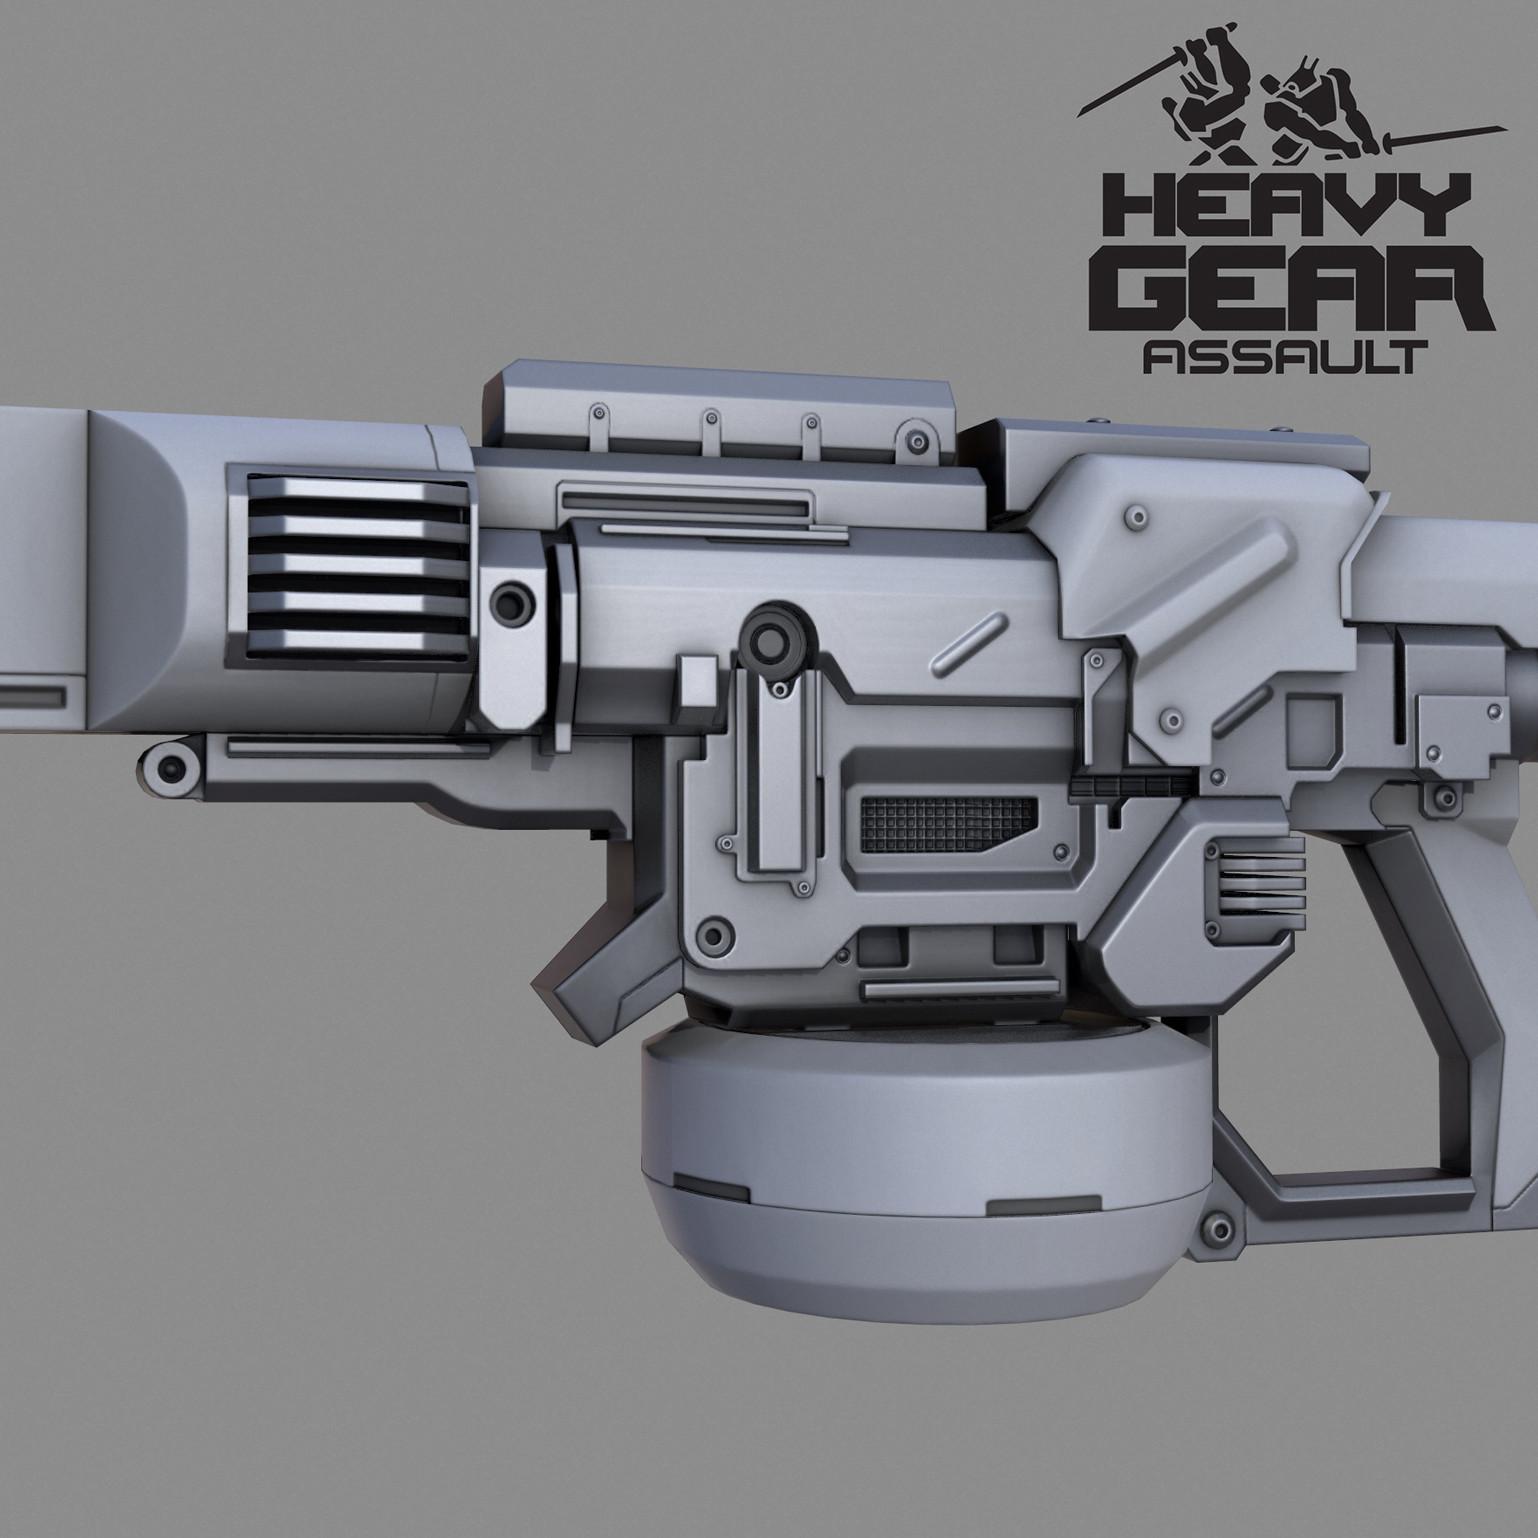 Heavy Laser Canon